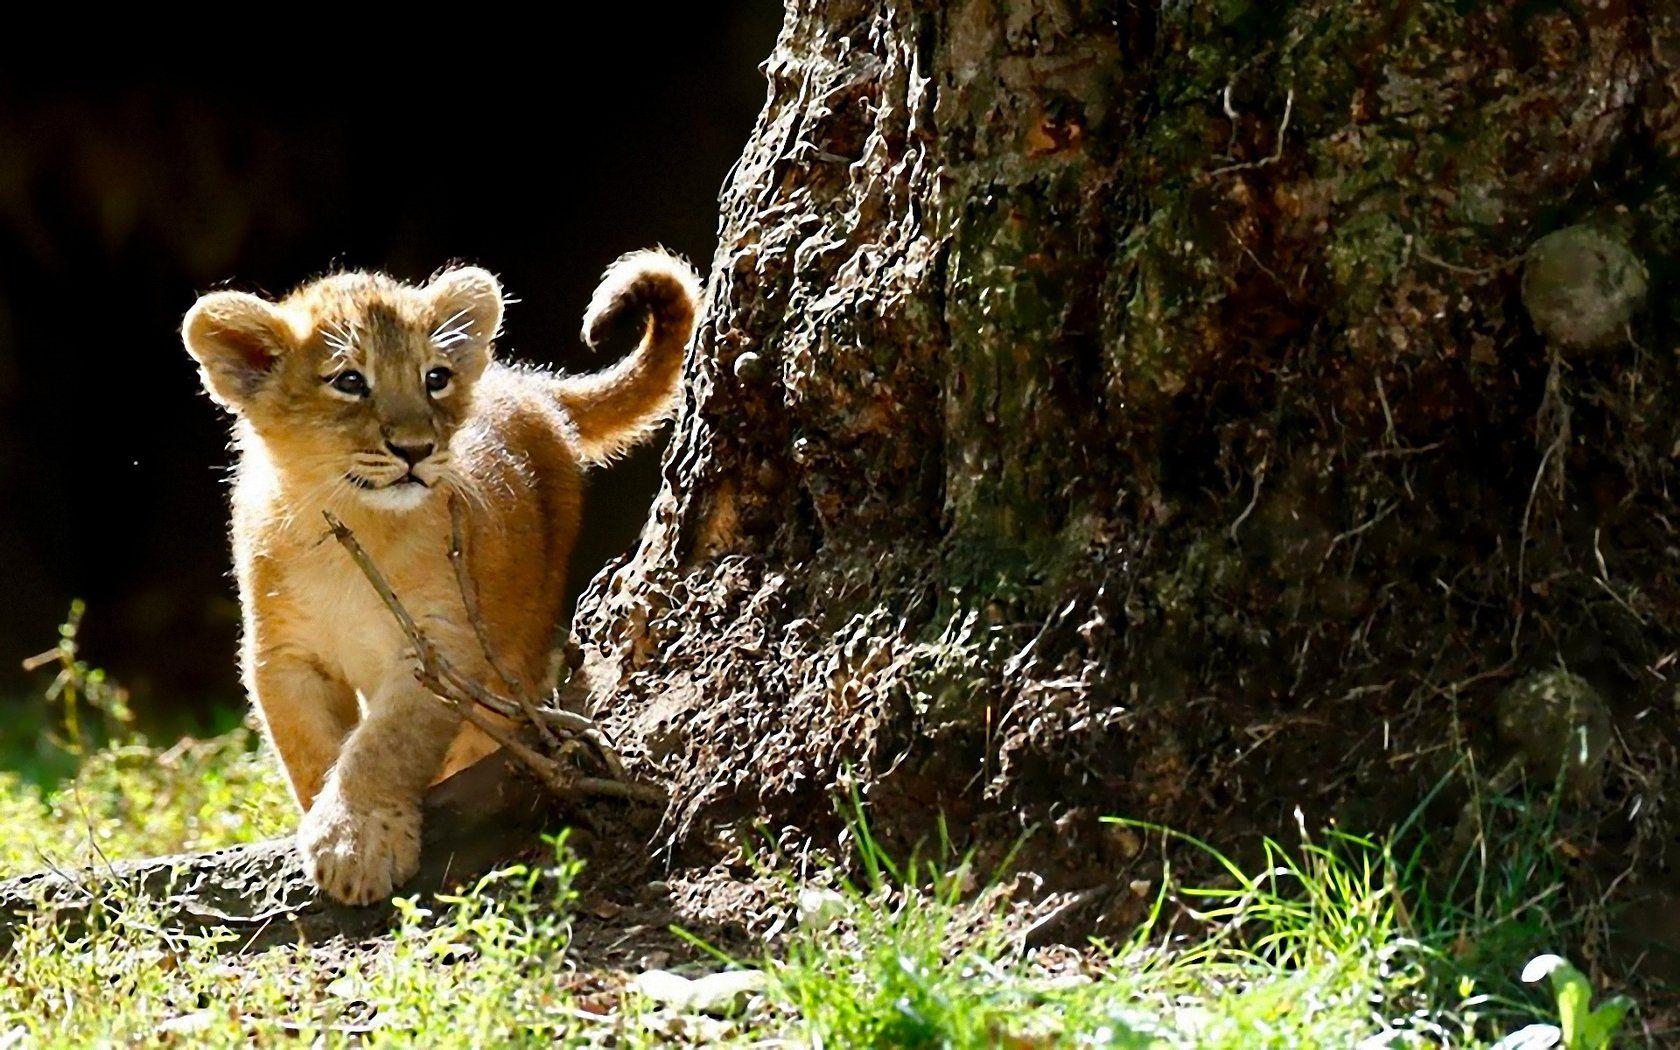 Cute Lion Cubs Wallpaper Www Topsimages Com